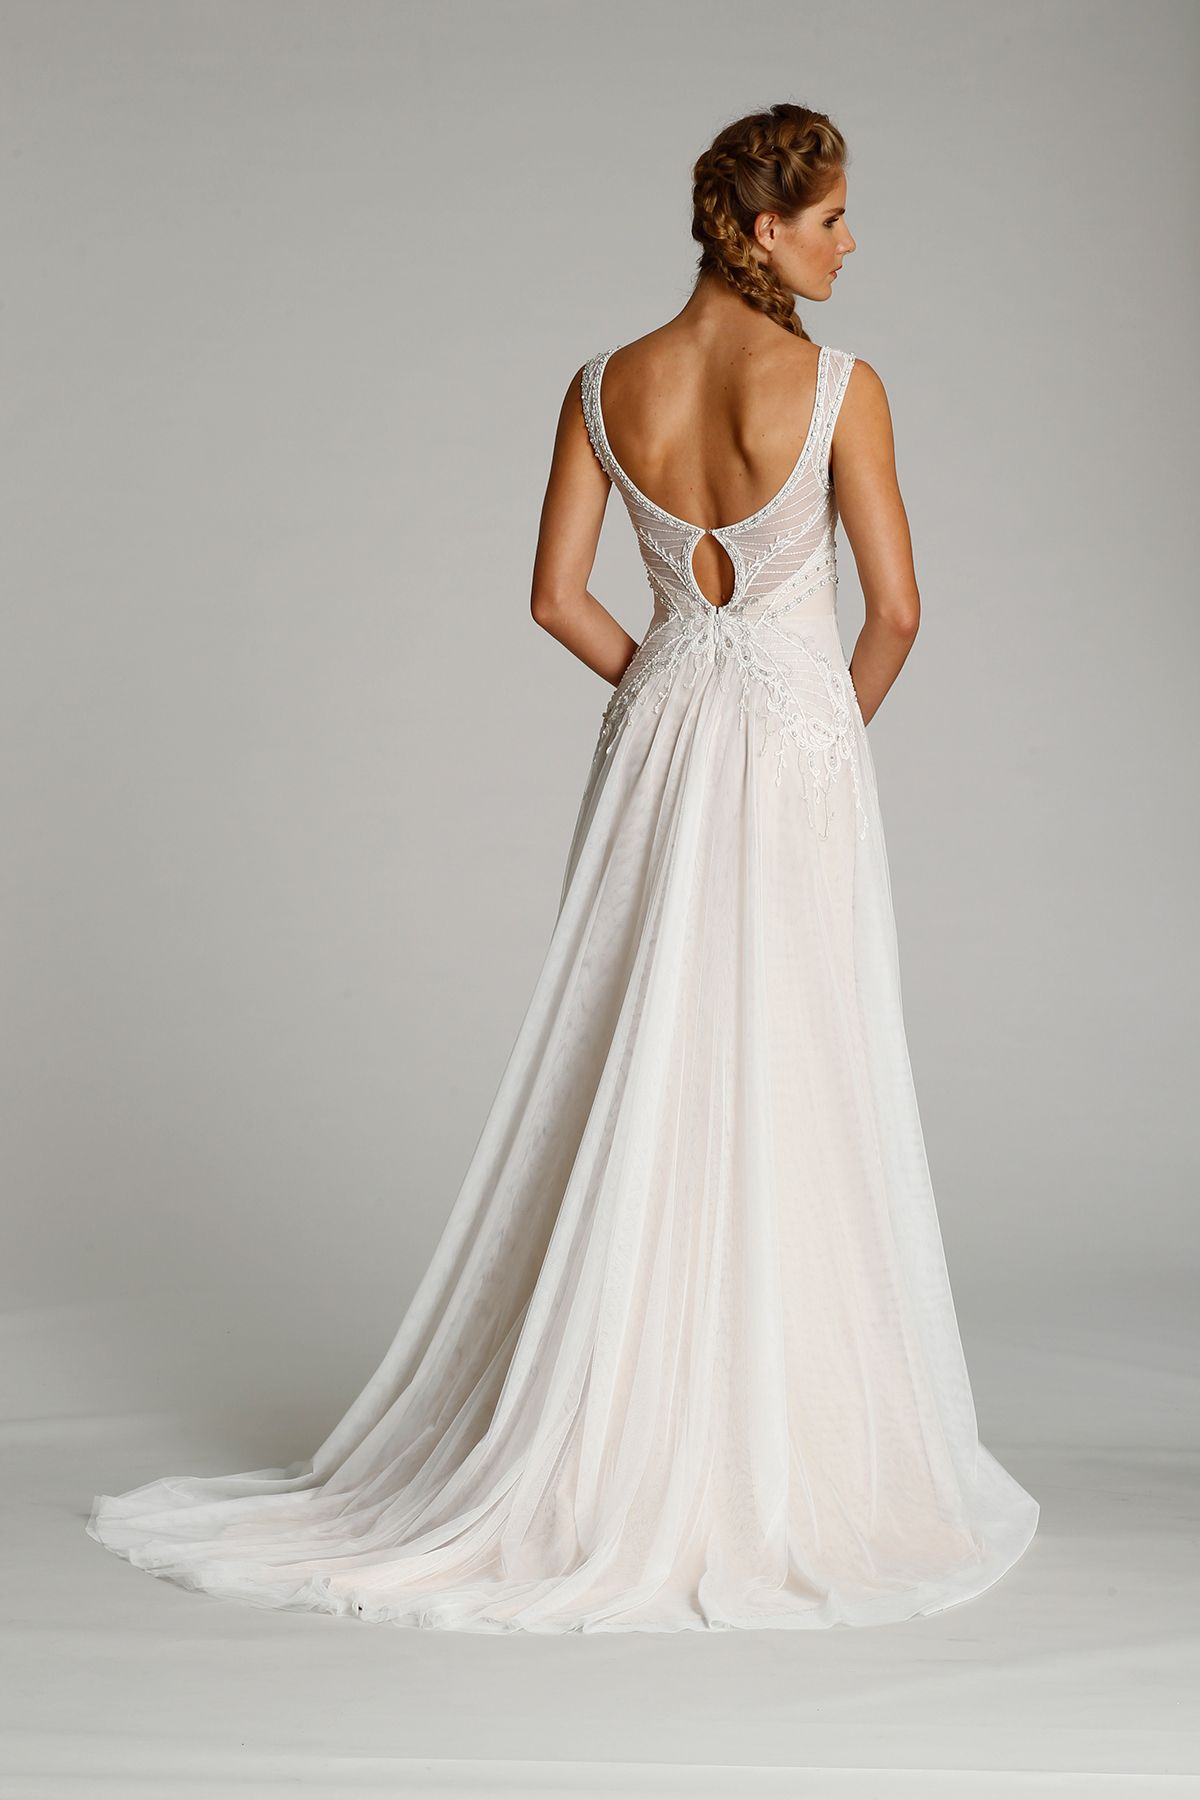 Style back view heart aflutter bridal pinterest wedding